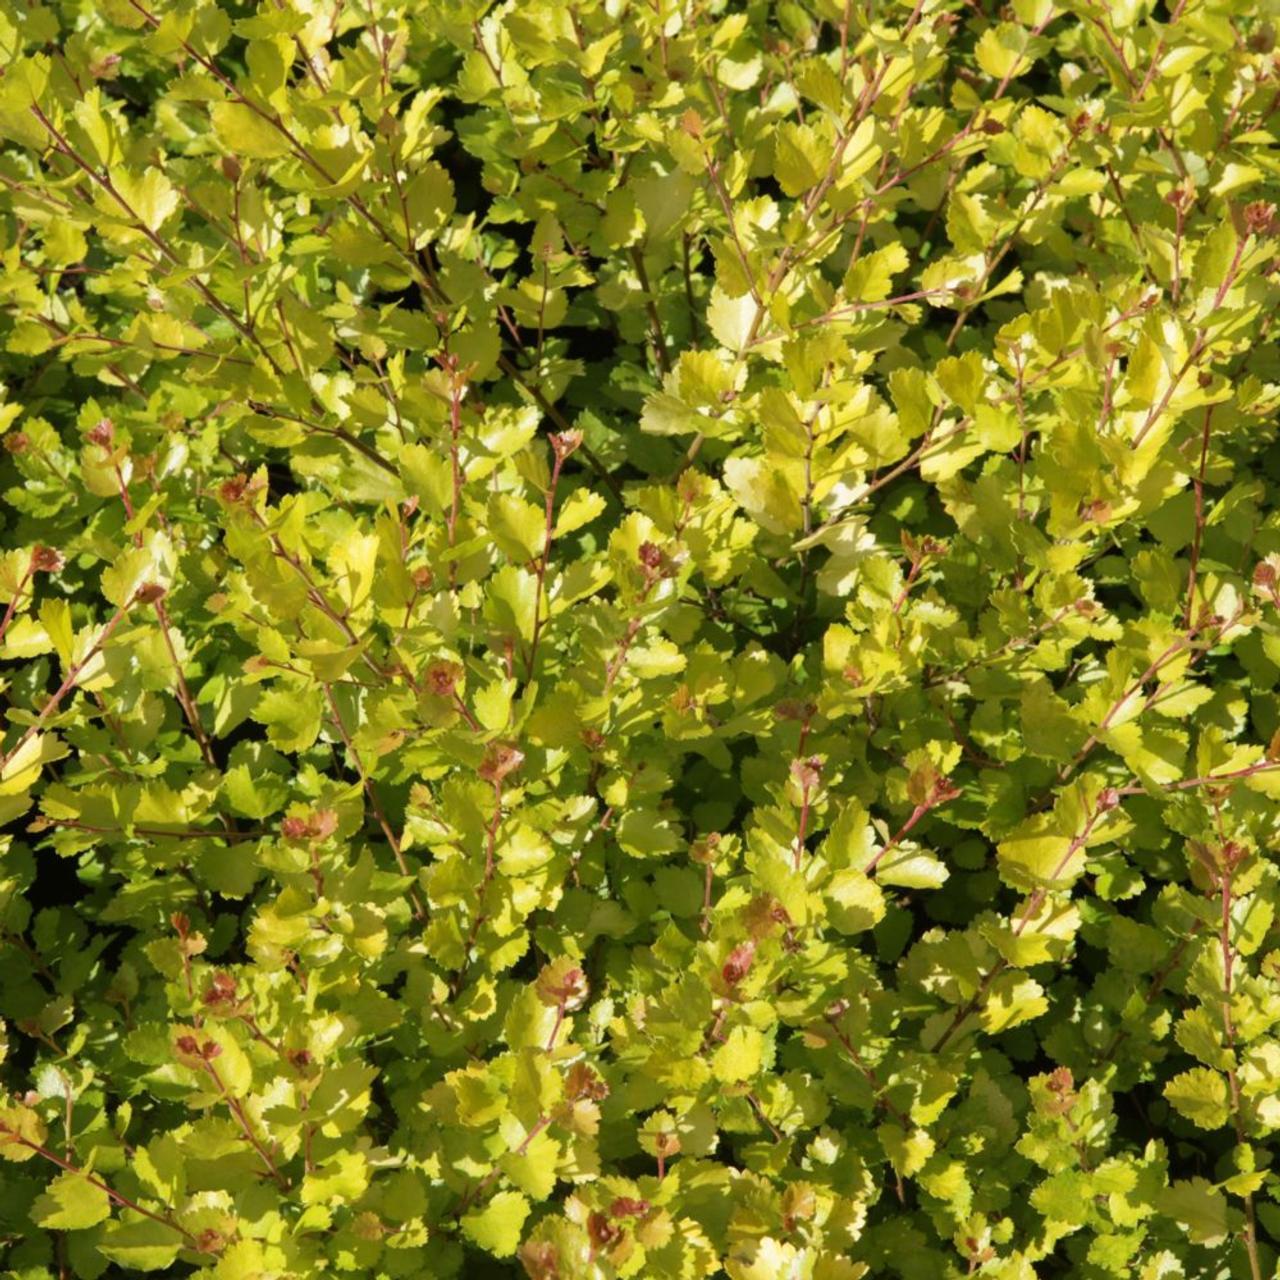 Betula nana 'Golden Treasure' plant